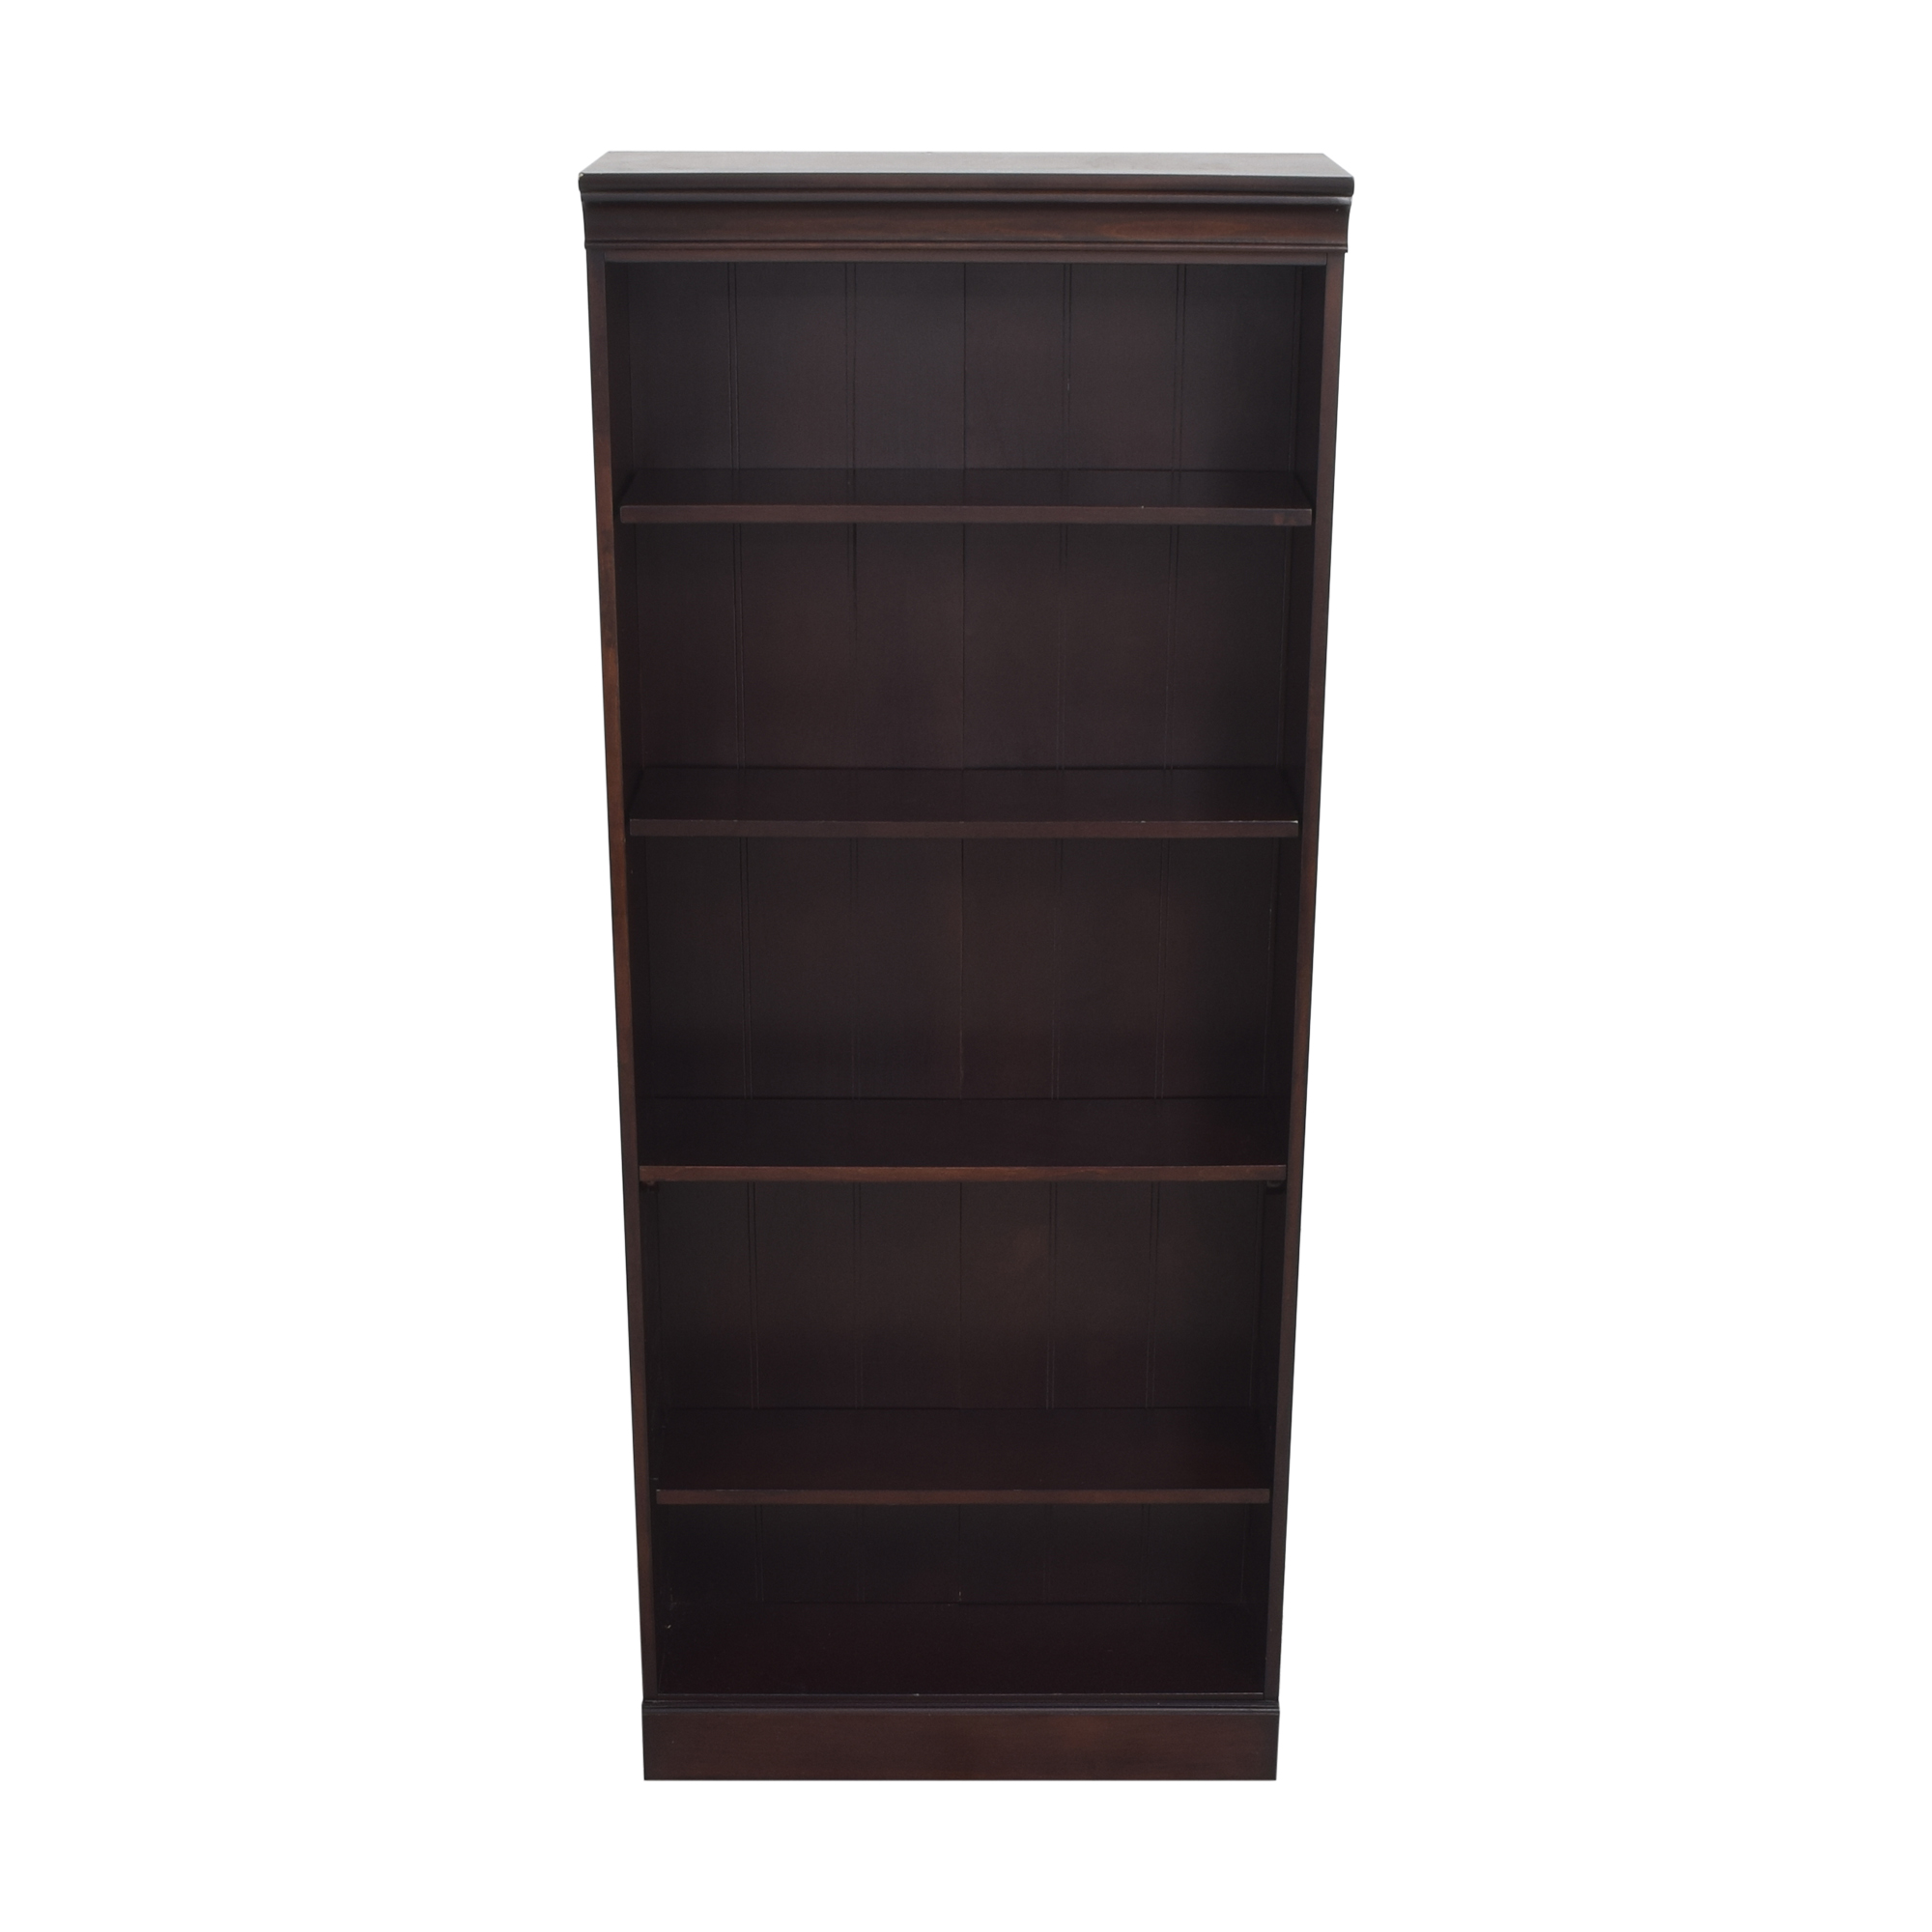 Raymour & Flanigan Large Bookcase / Storage